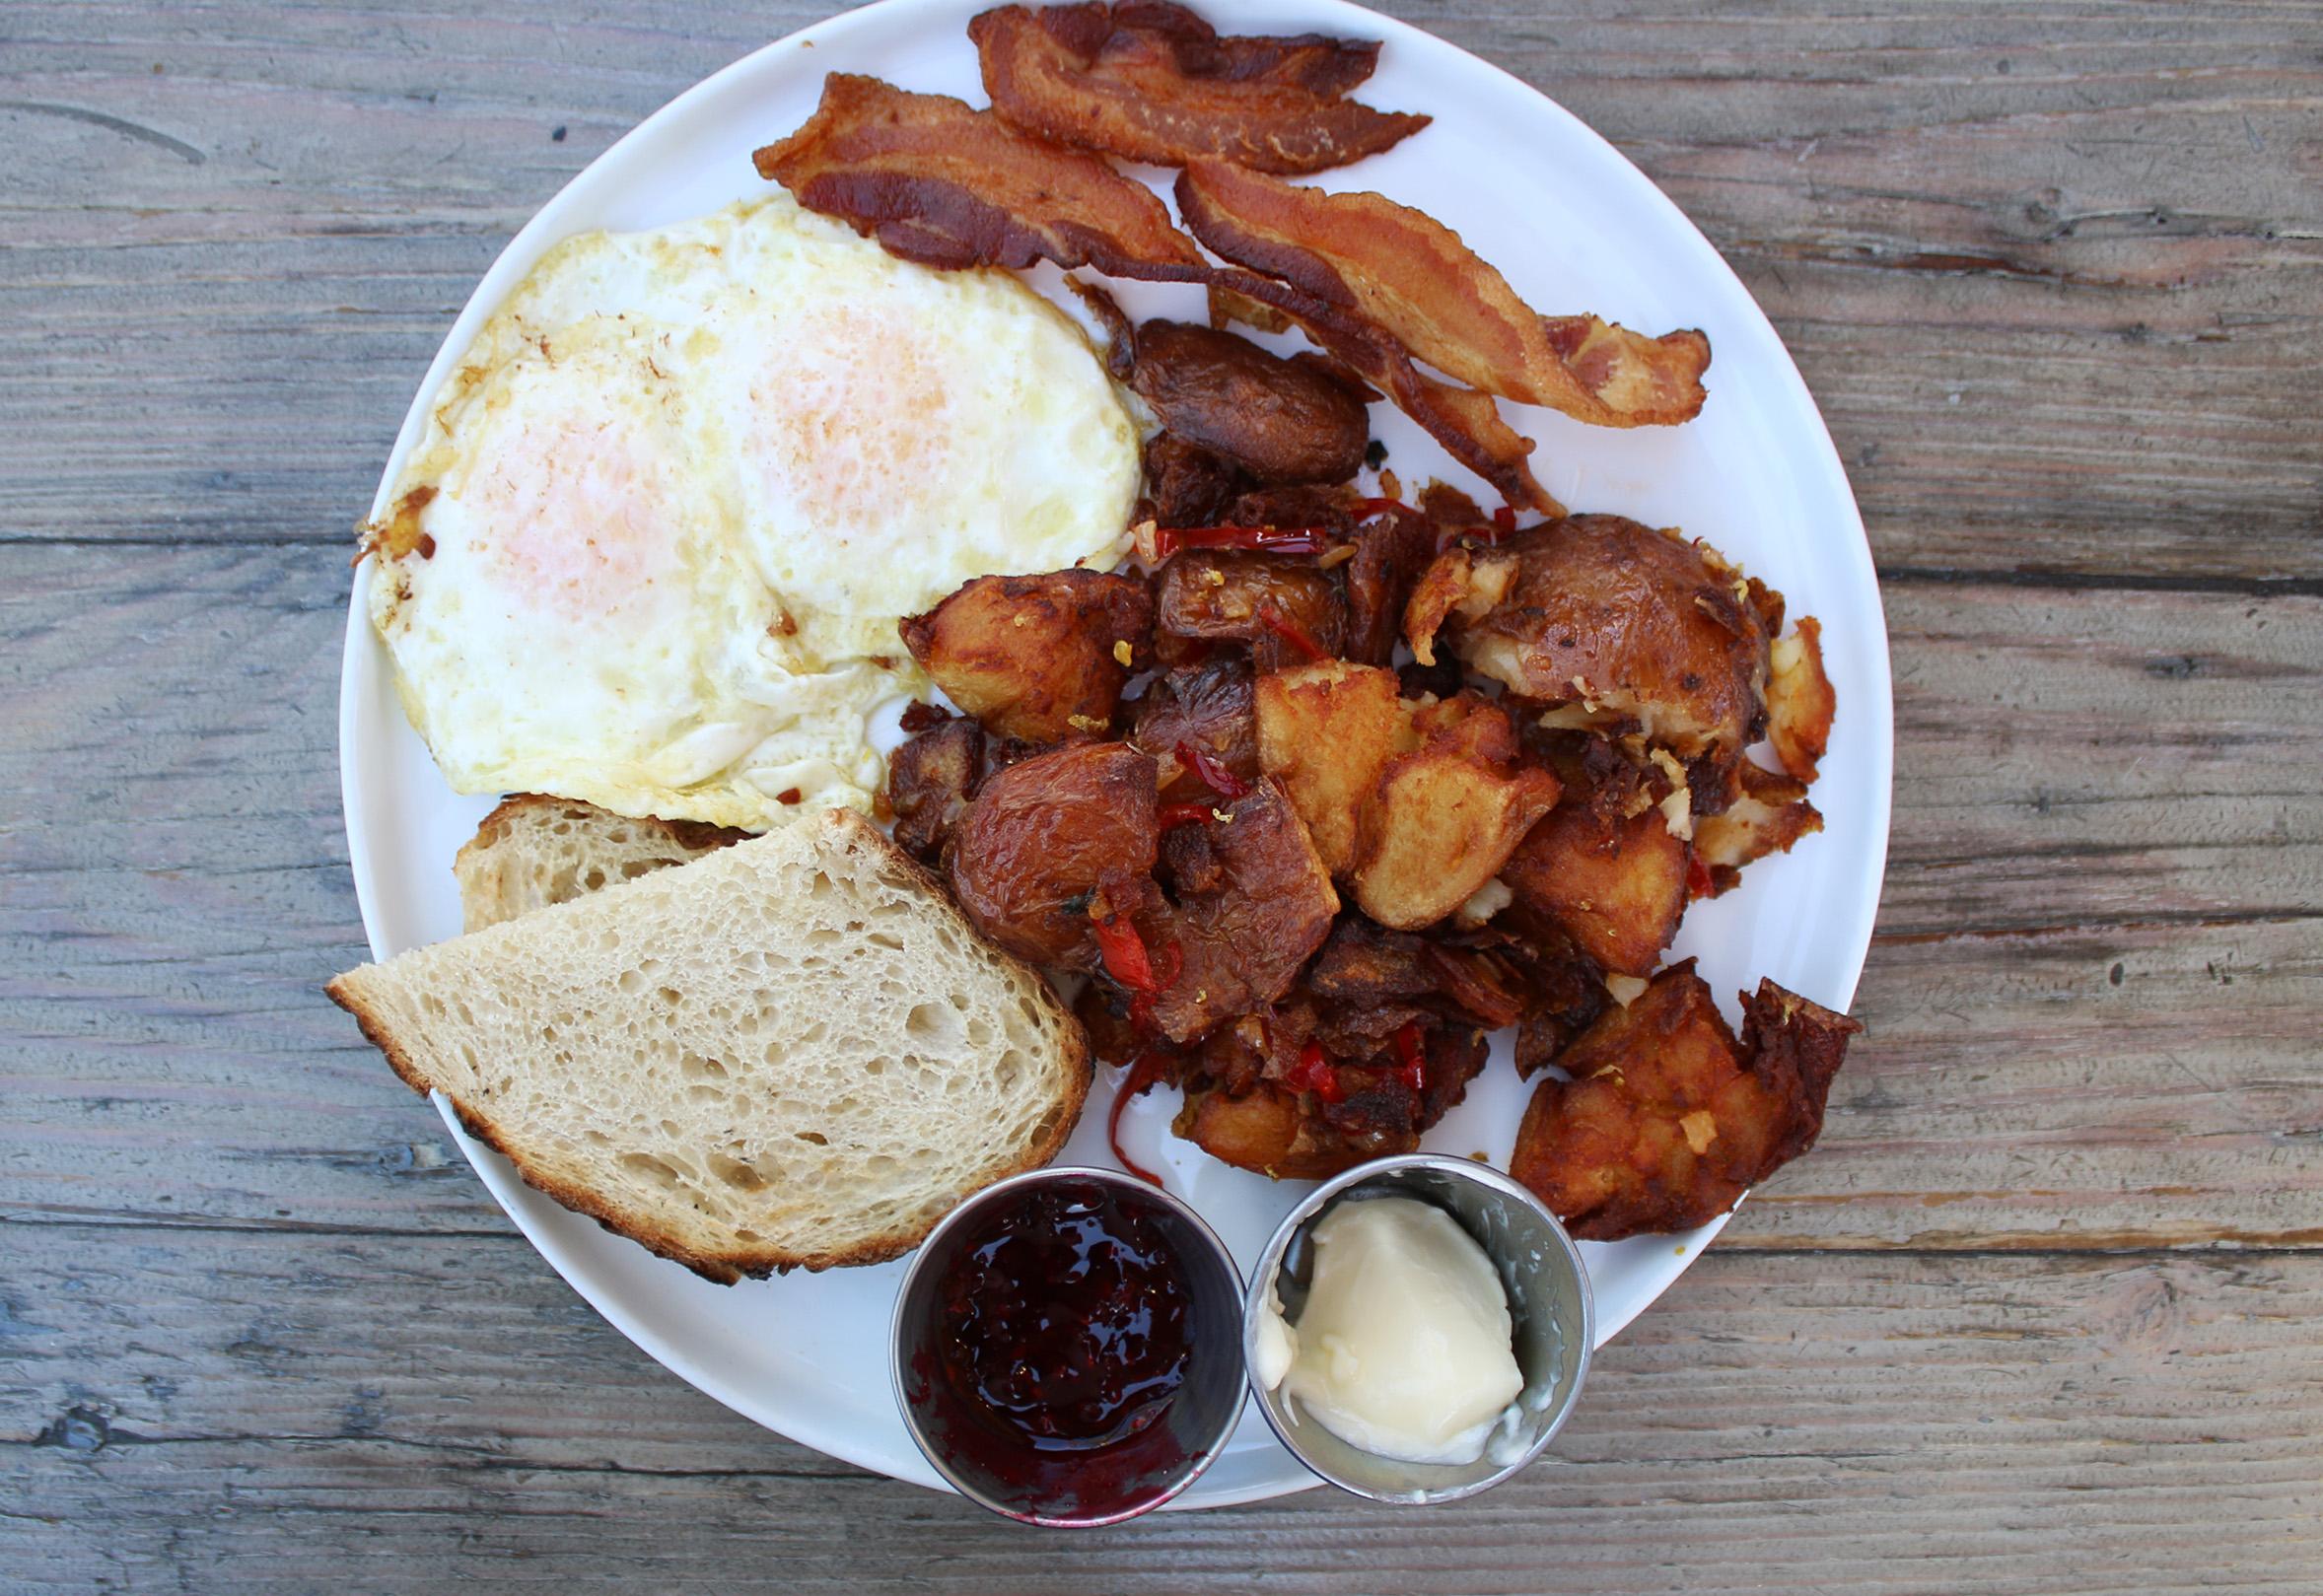 Not-So-Country Breakfast: two eggs, smoky bacon, crispy potatoes, toast & jam